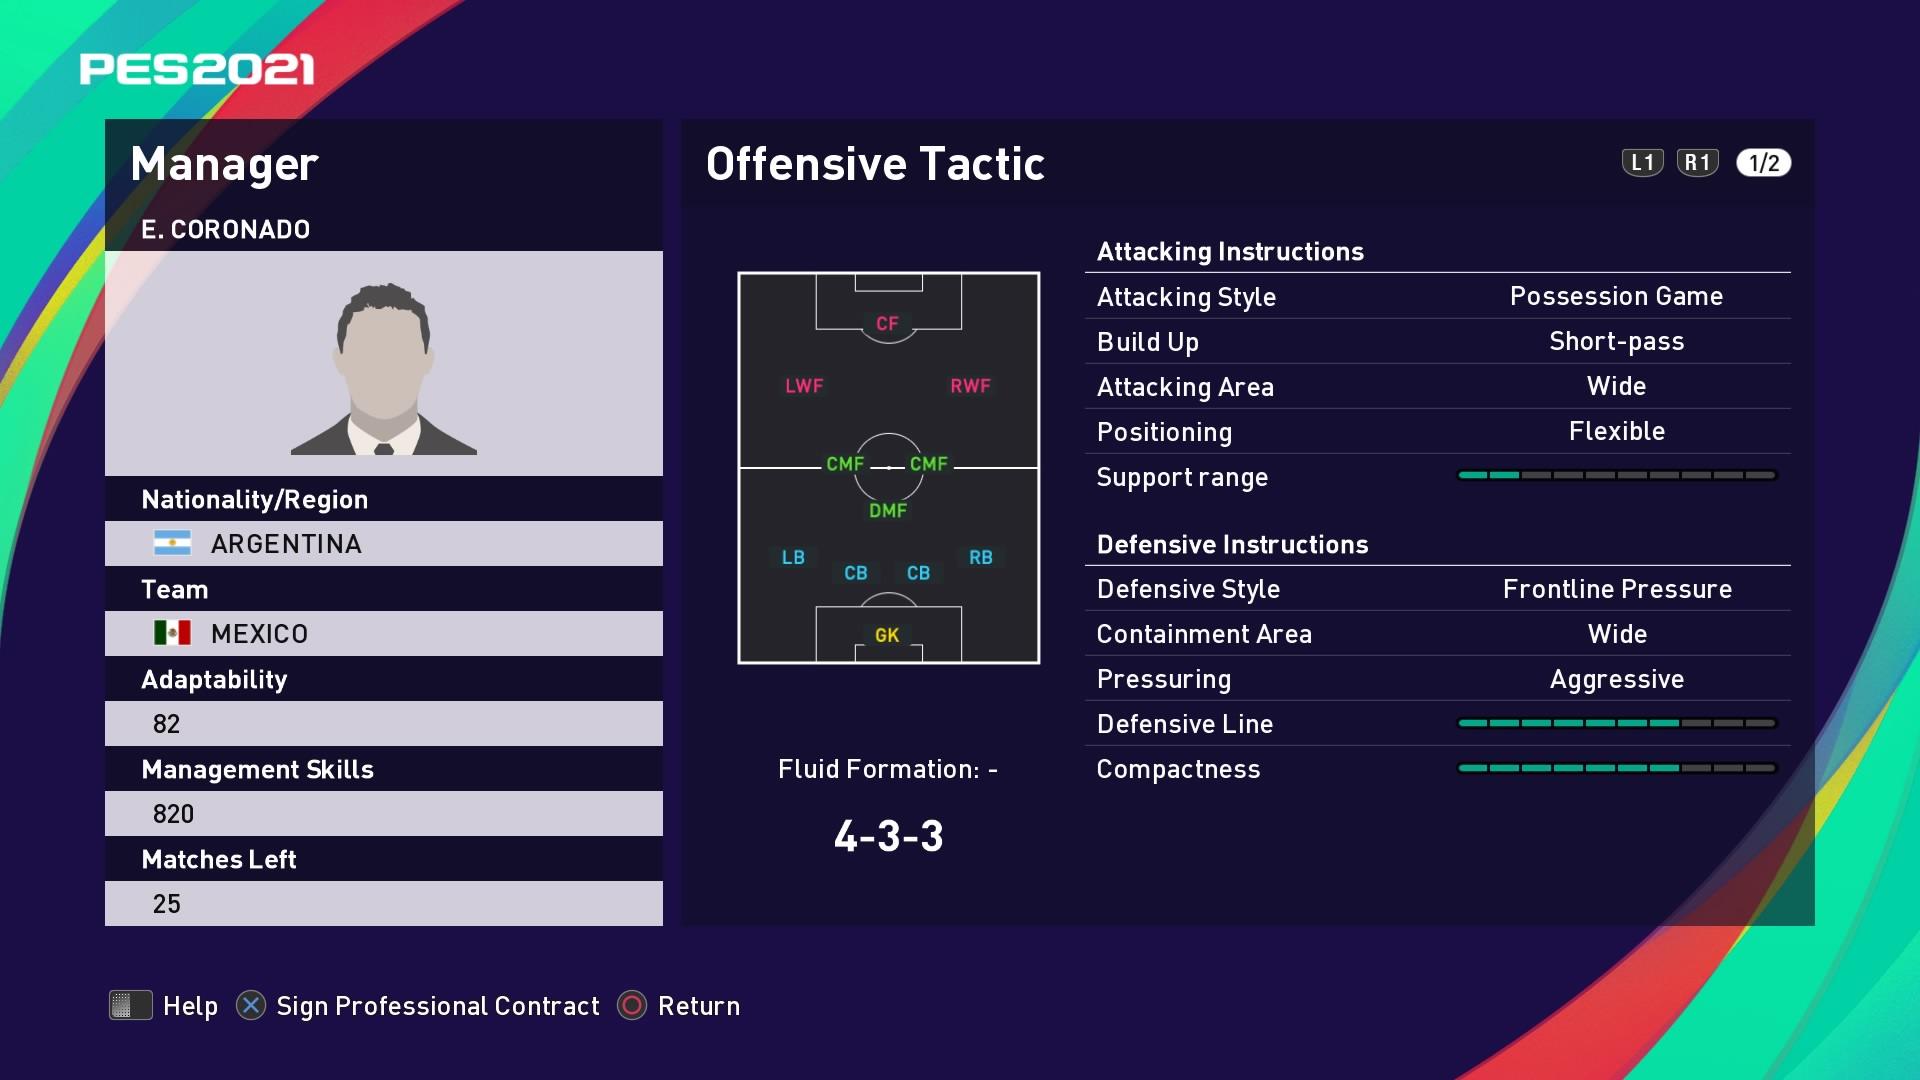 "E. Coronado (Gerardo ""Tata"" Martino) Offensive Tactic in PES 2021 myClub"